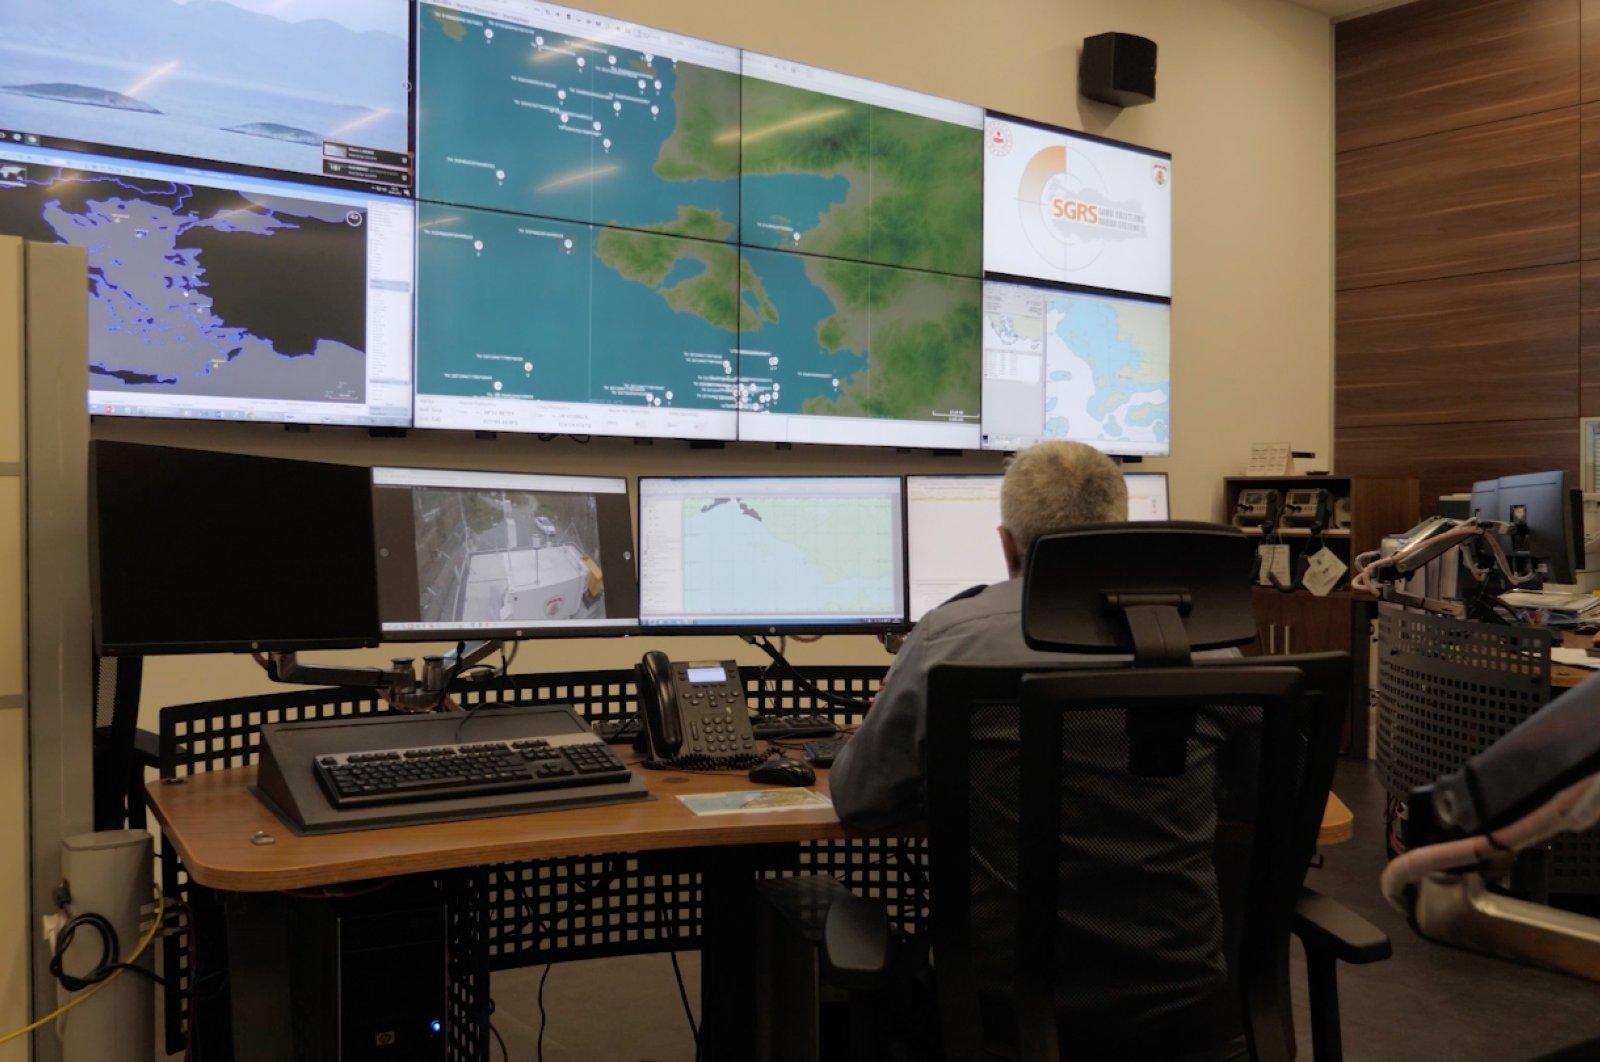 A coast guard official using the new Coast Surveillance Radar System (SGRS) on June 7, 2020. (Turkey's Presidency of Defense Industries Undersecretariat)